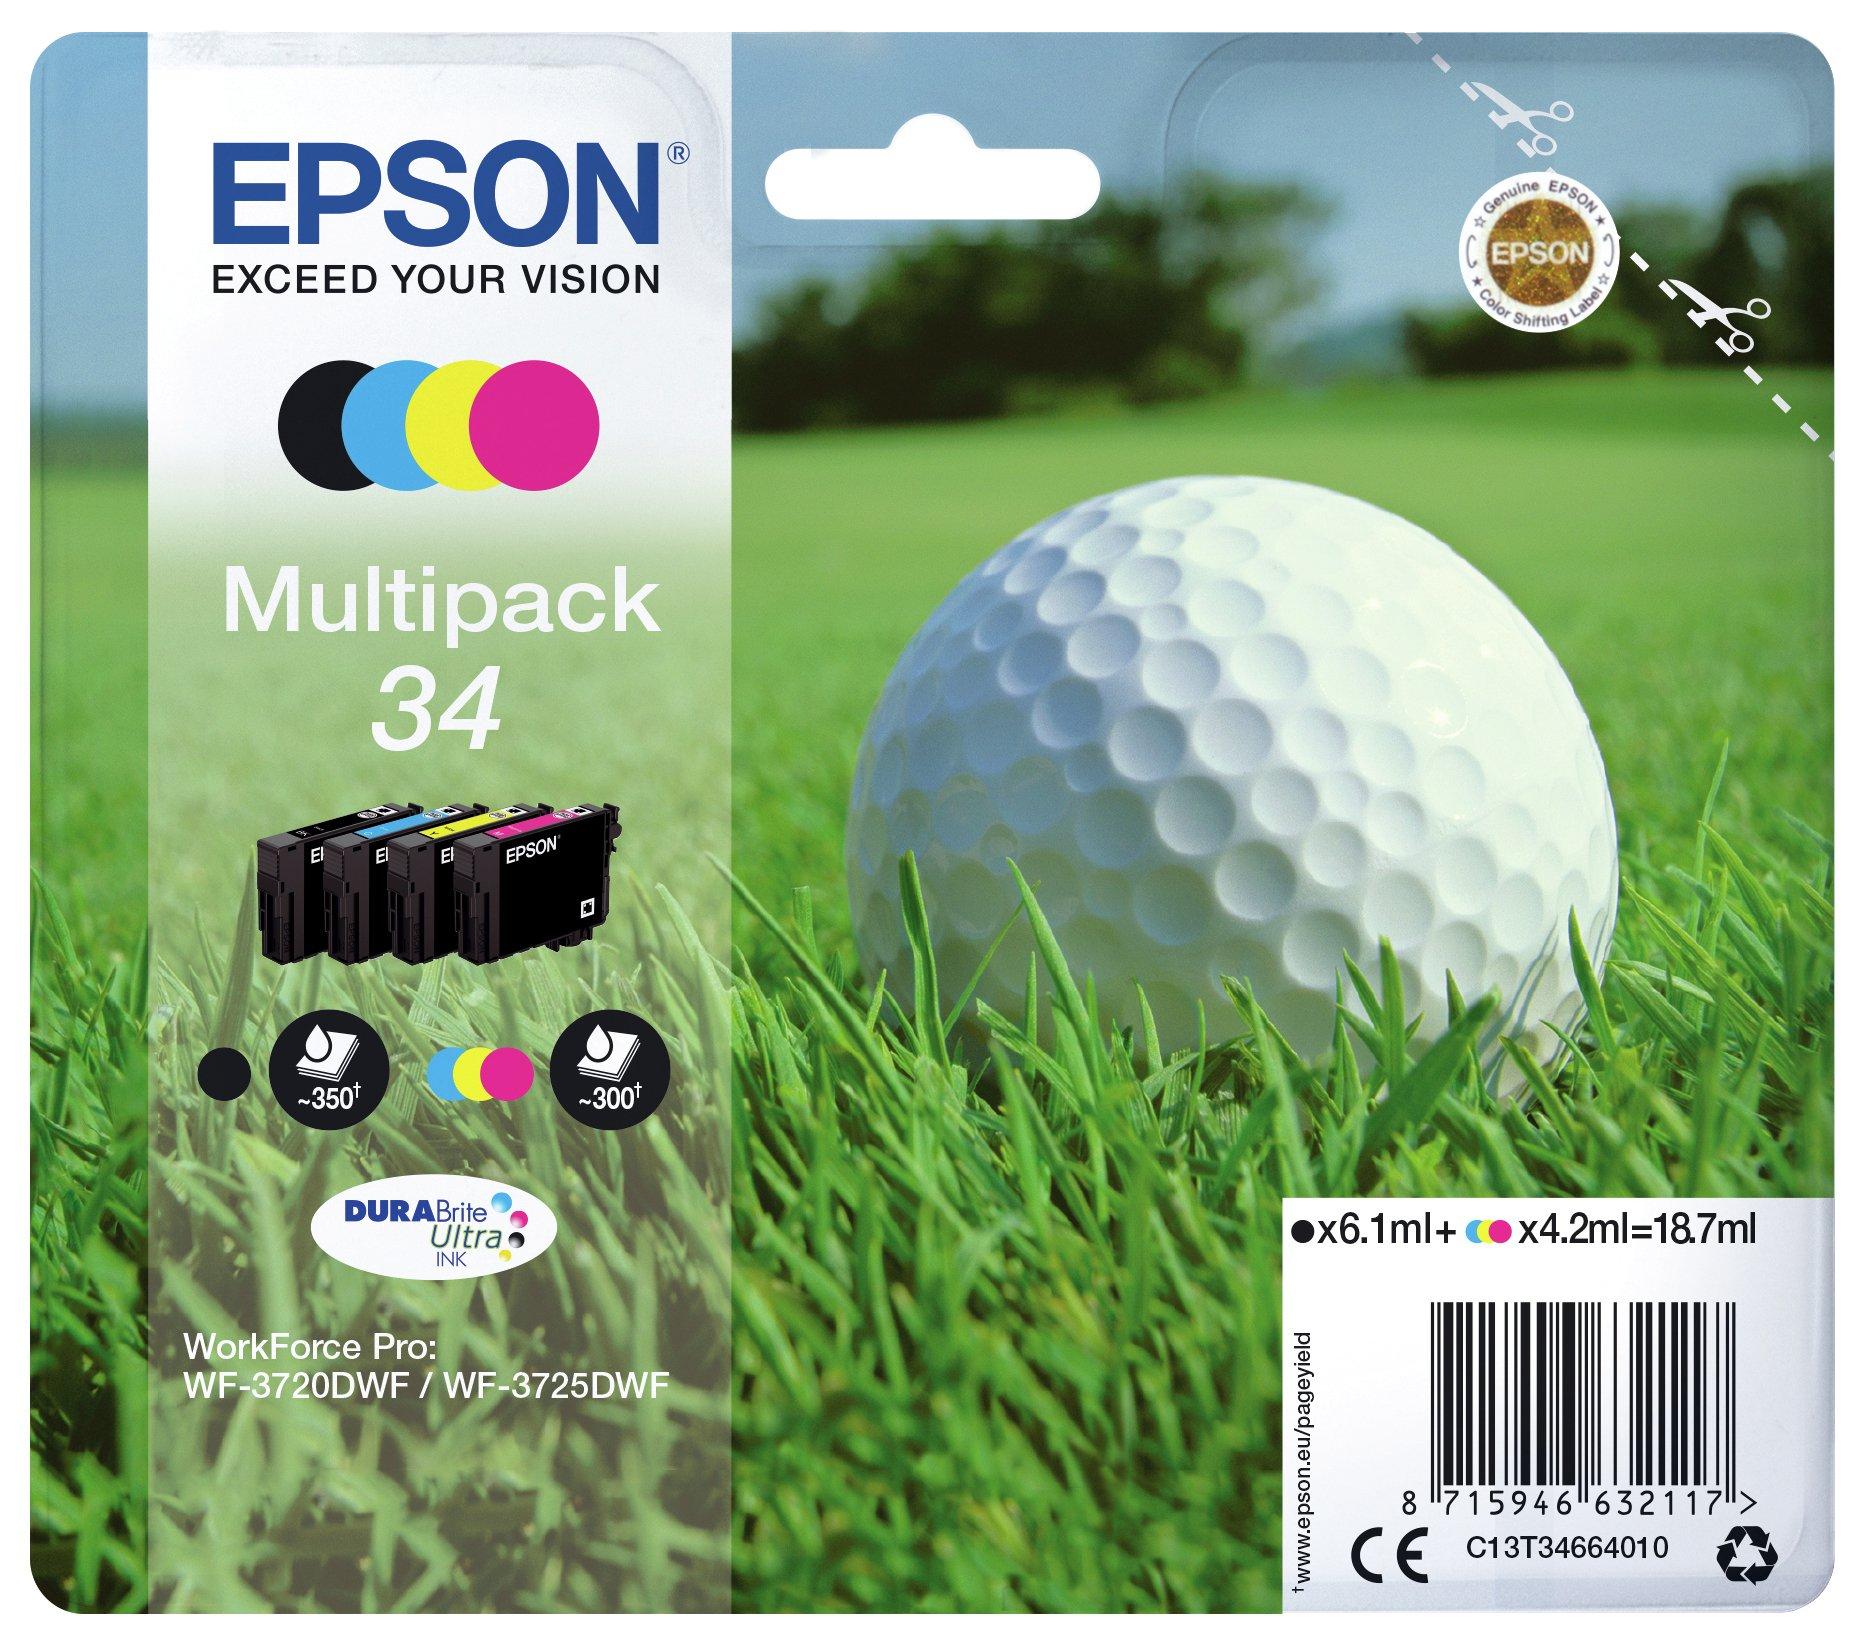 Epson Golf Ball 34 Ink Cartridges - Black & Colour